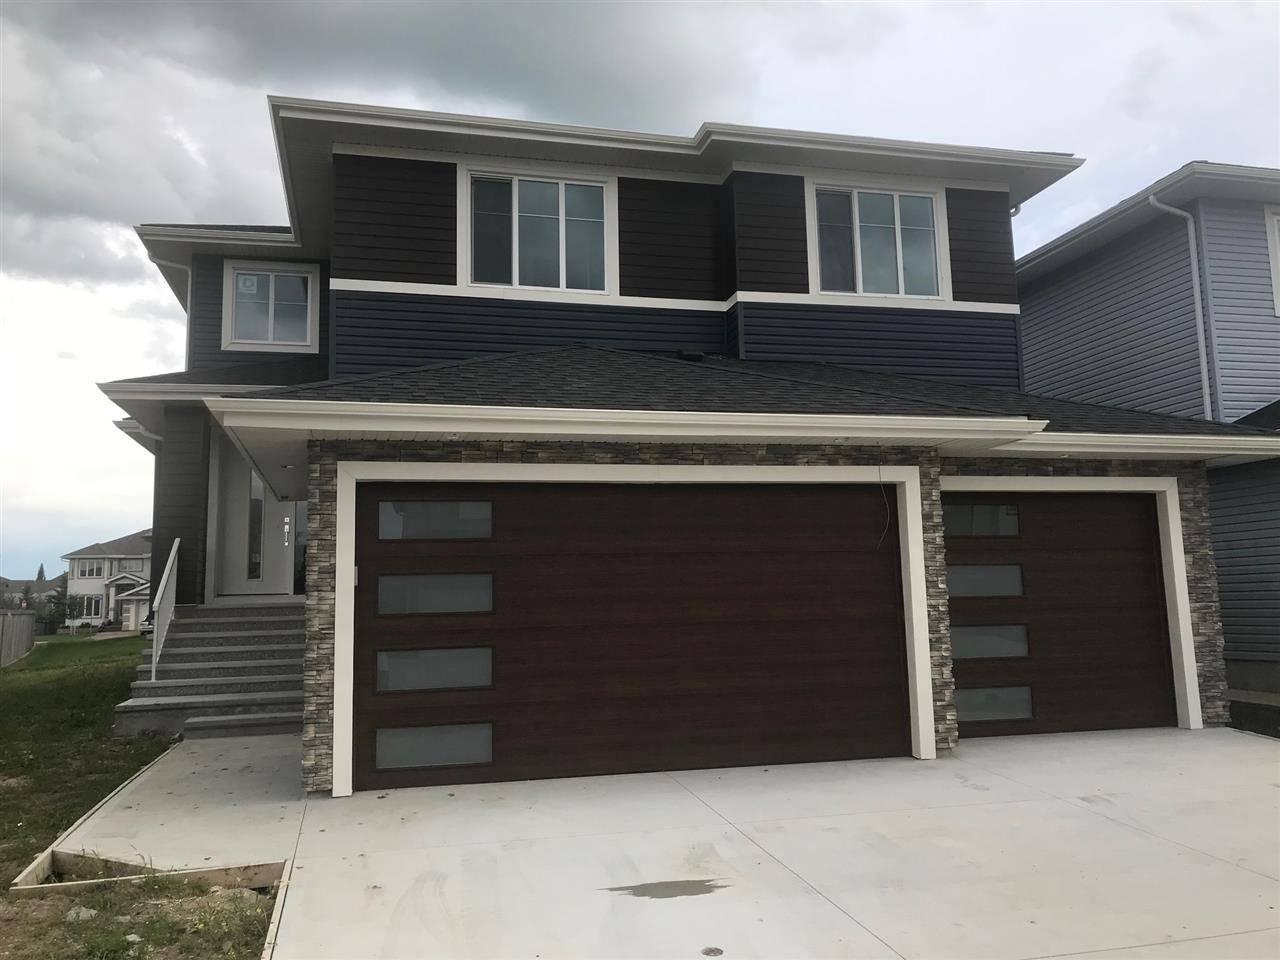 House for sale at 16 Shorewood Cres Leduc Alberta - MLS: E4146992